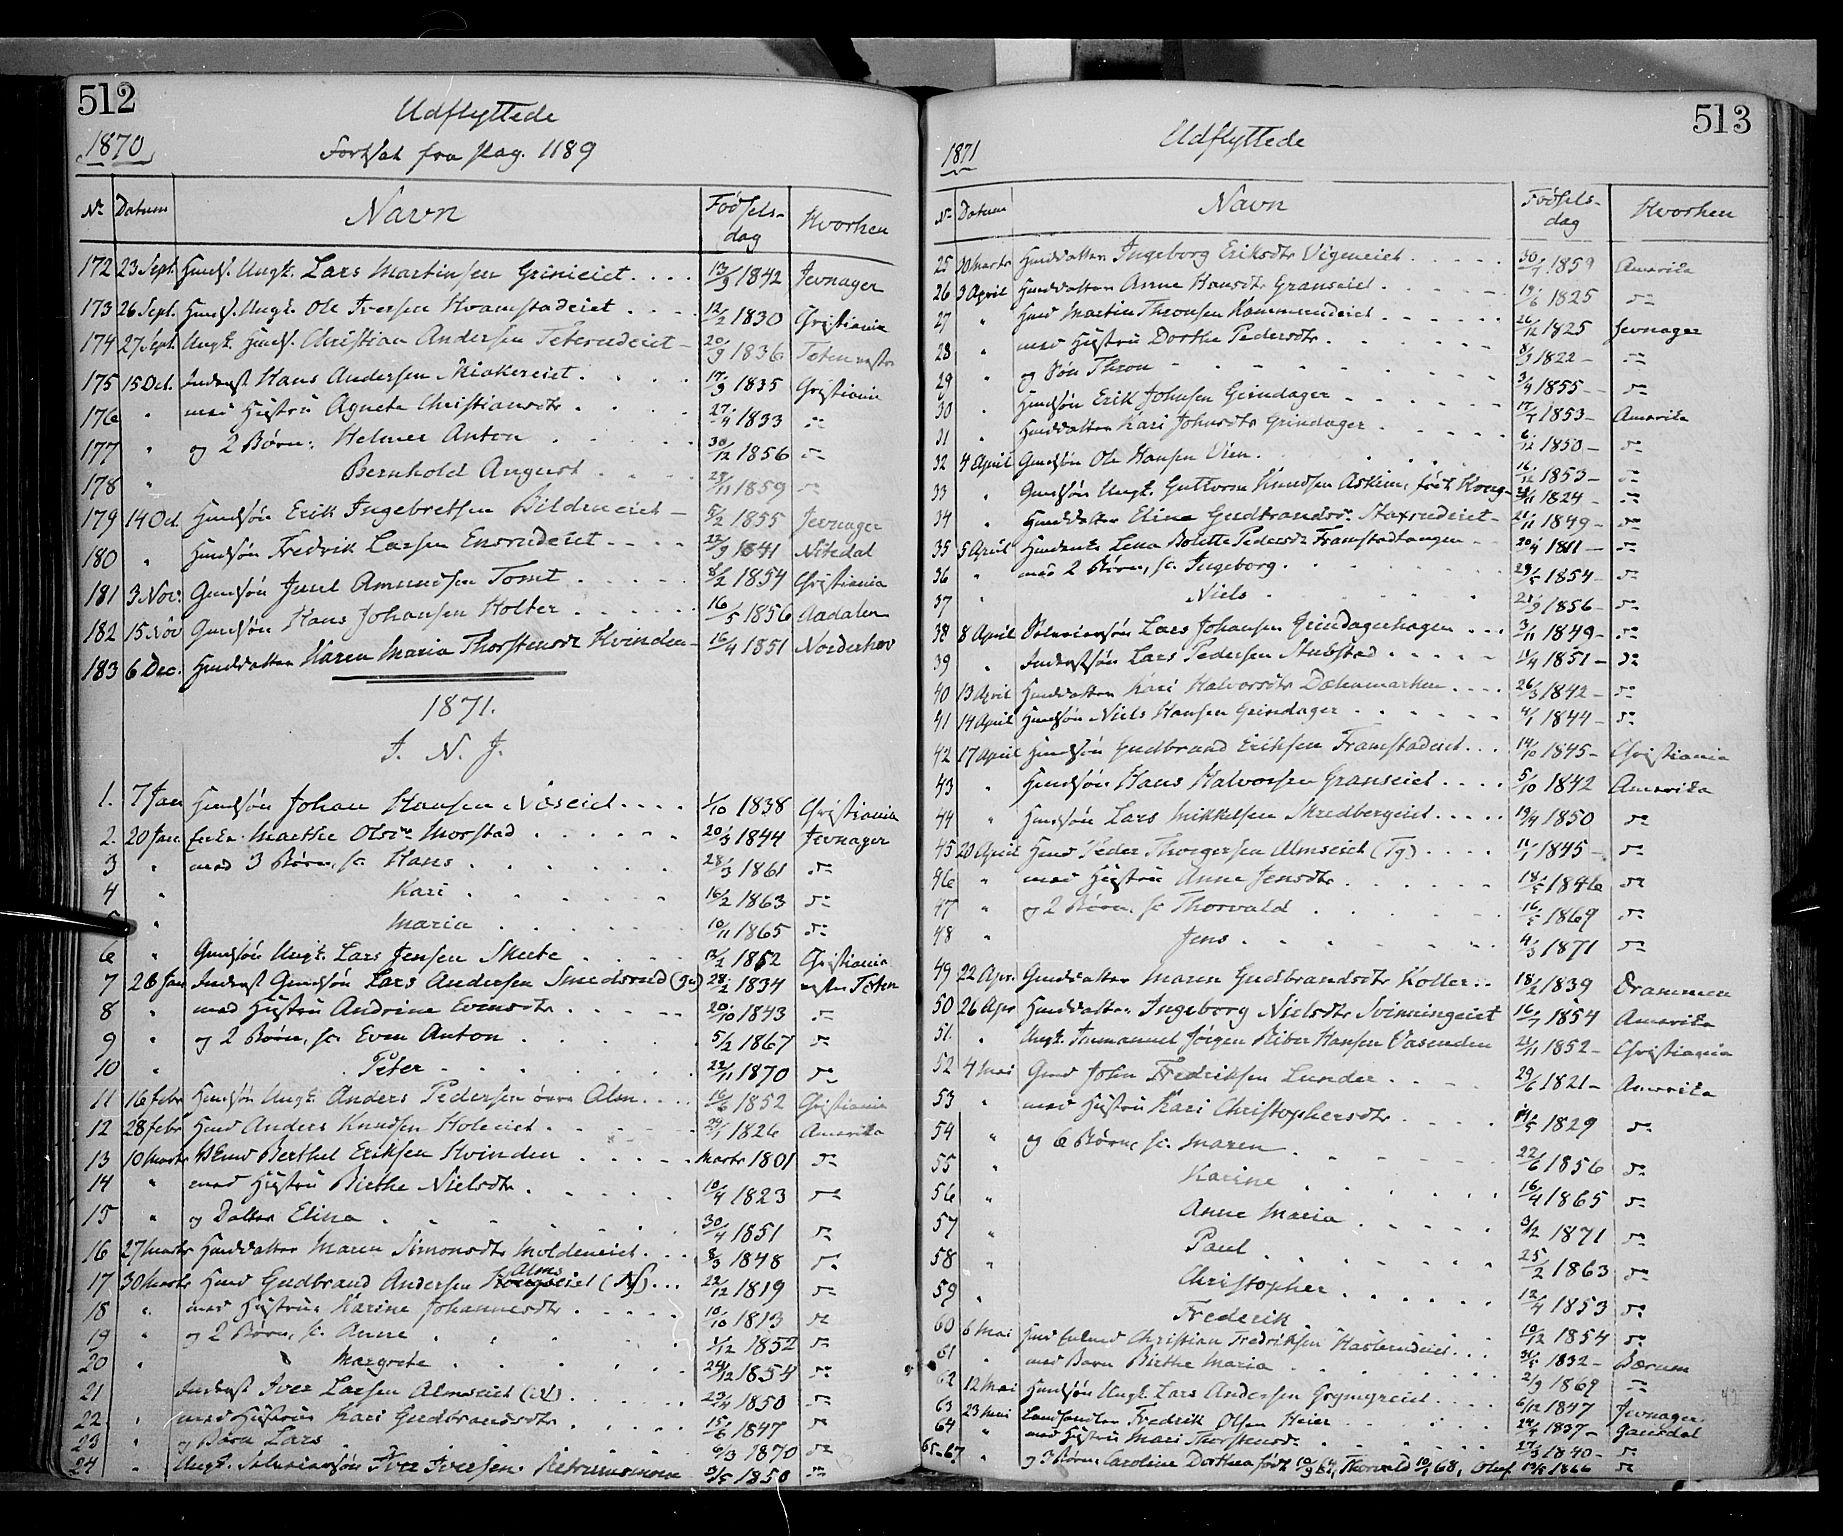 SAH, Gran prestekontor, Ministerialbok nr. 12, 1856-1874, s. 512-513